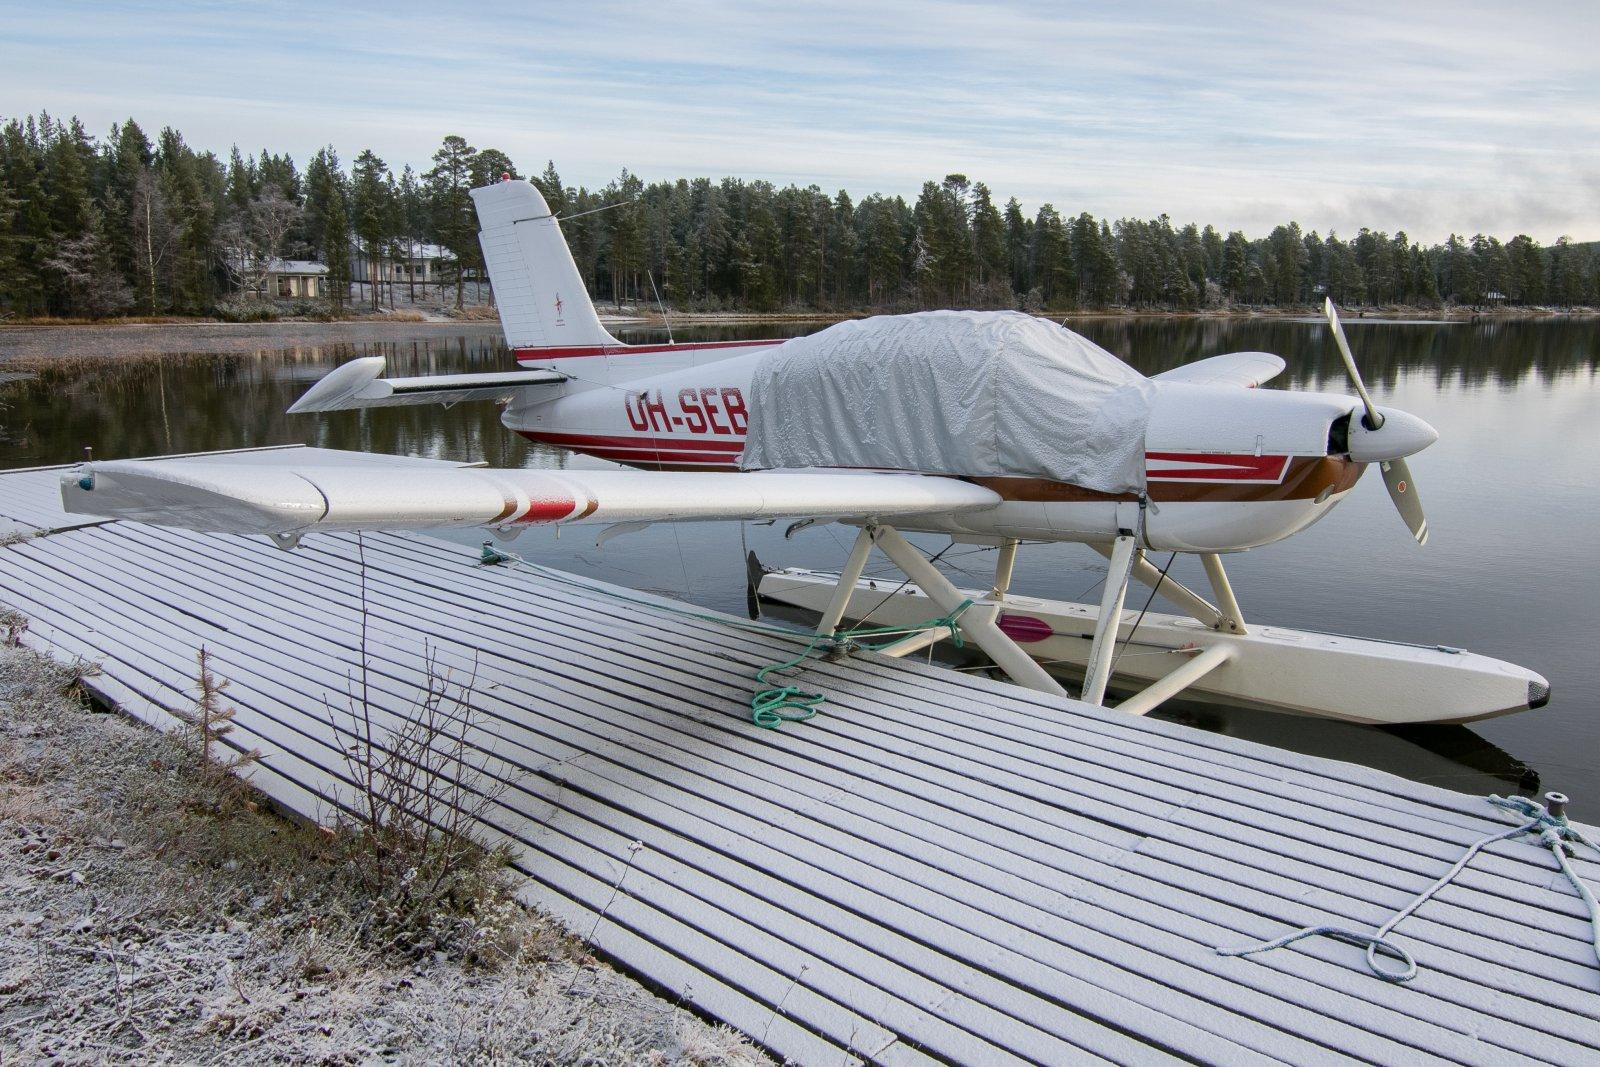 OH-SEB. Alajärven lentosatamassa. 17.10.2020.